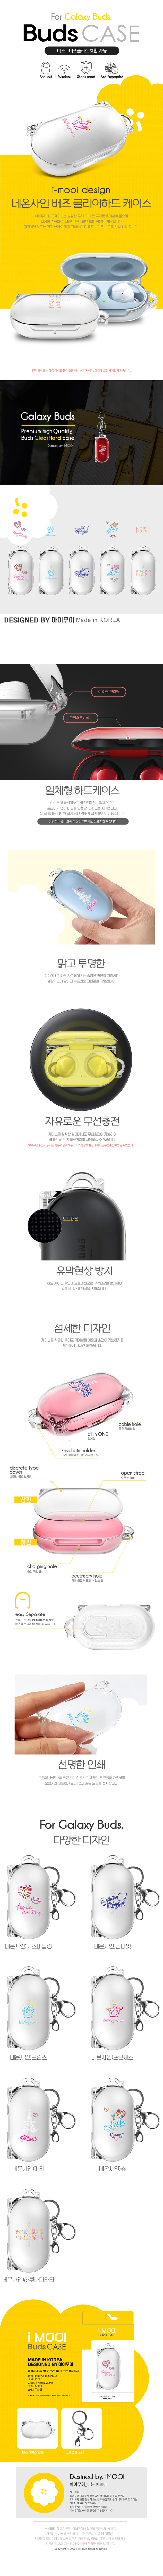 imooi 네온사인 갤럭시 버즈+ 버즈 투명 하드 케이스 - 원스, 13,900원, 이어폰, 이어폰 악세서리